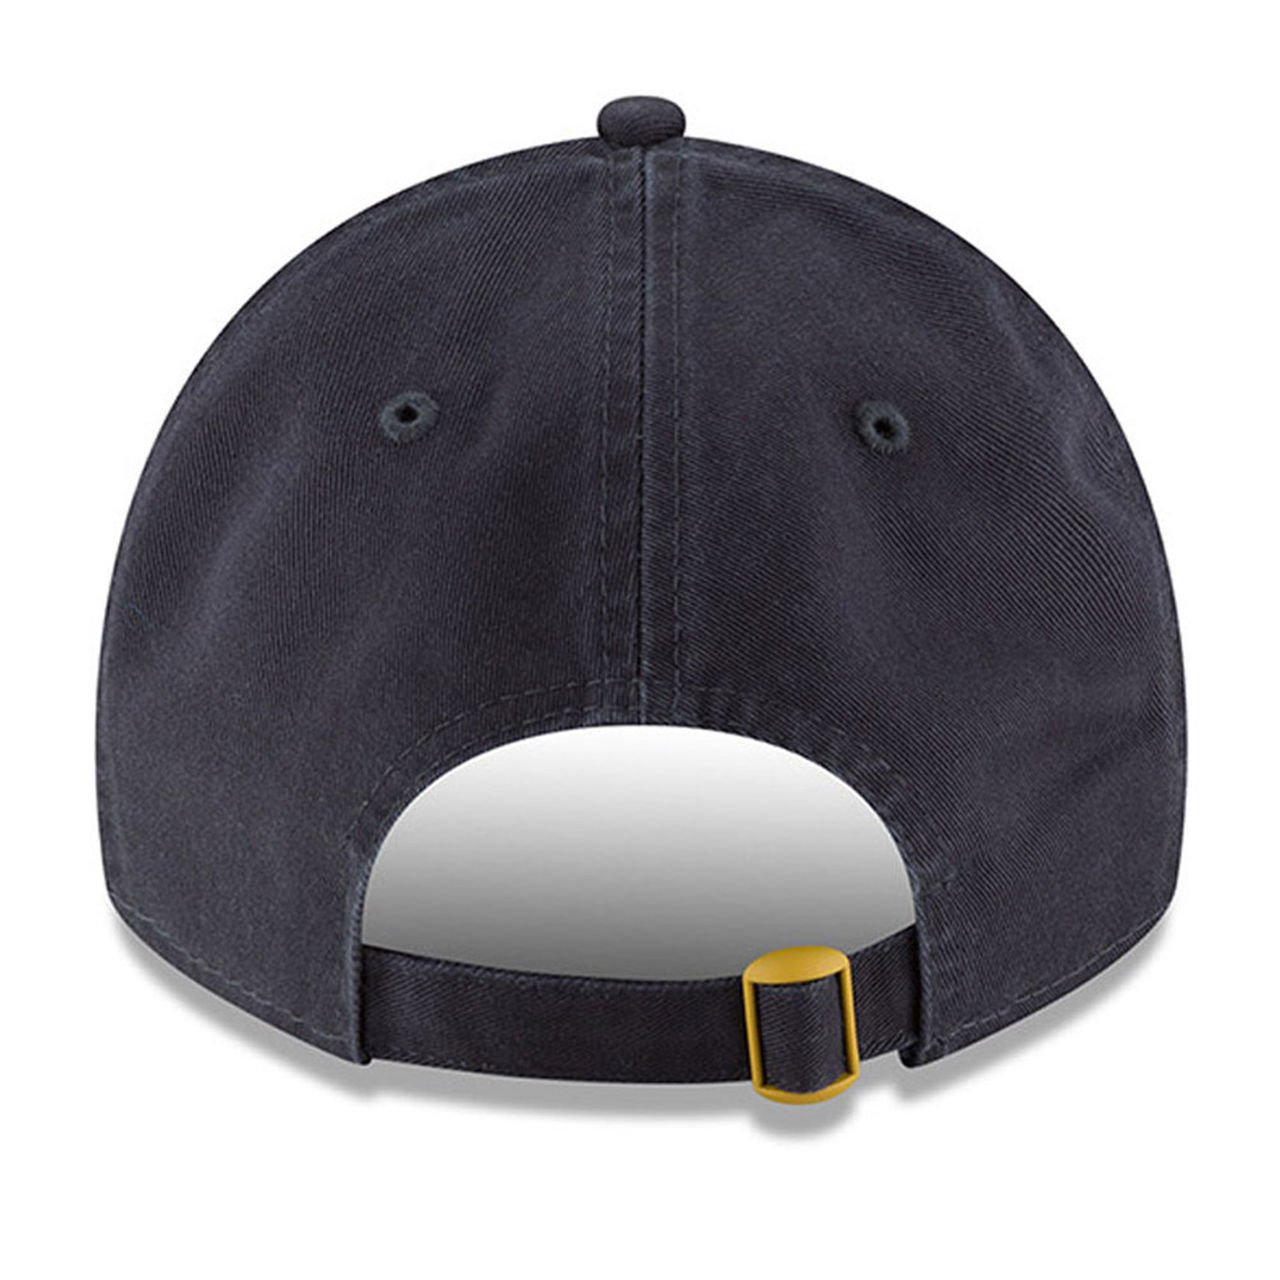 promo code 5e29e 87666 Amazon.com   New Era St. Louis Cardinals 2018 July 4th Stars and Stripes 9TWENTY  Adjustable Hat   Sports   Outdoors